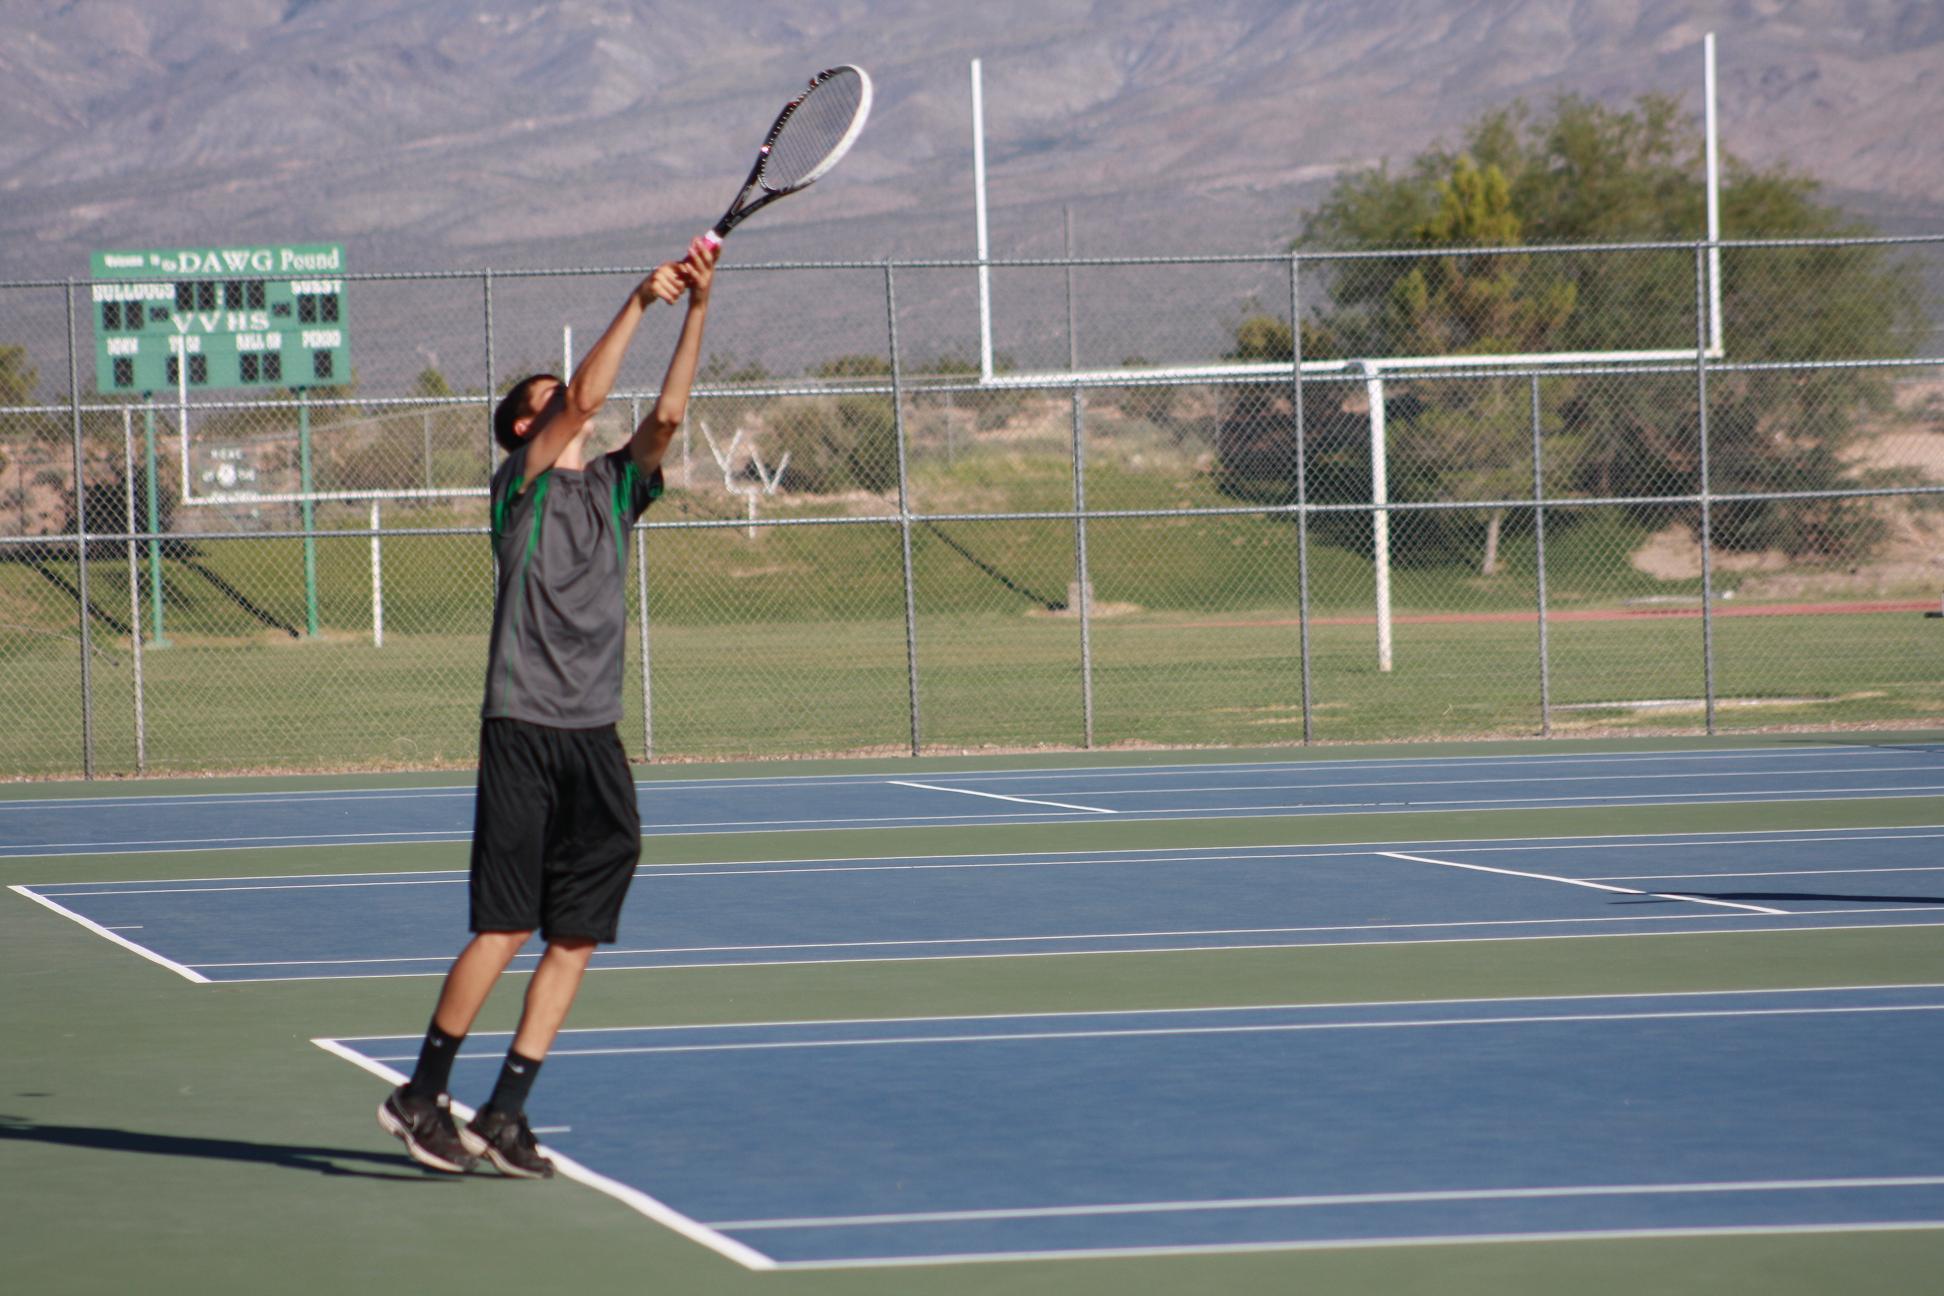 Bulldogs boys tennis defeats Roadrunners 12-6; Girls lose